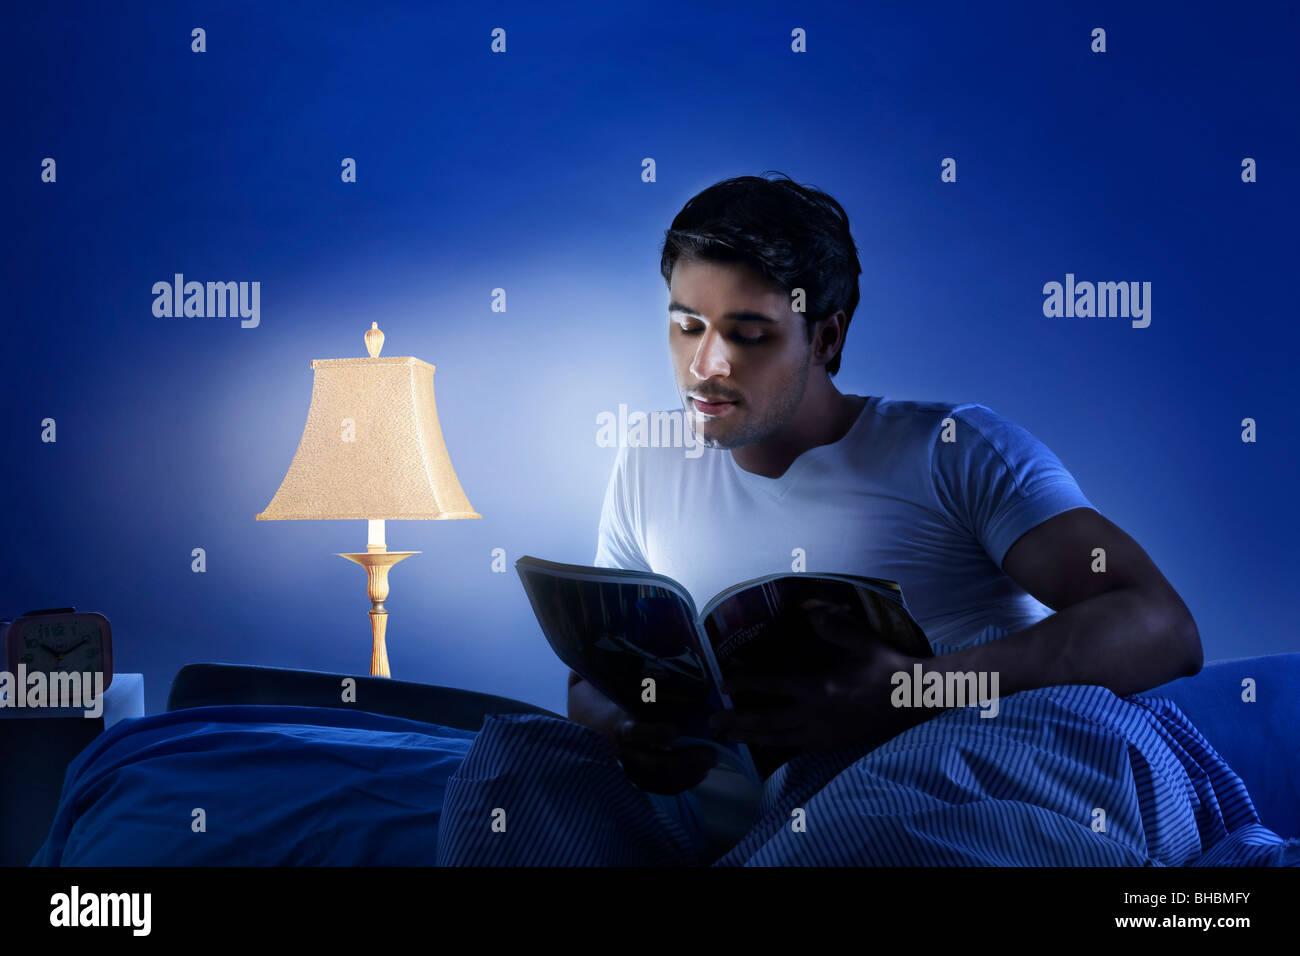 Man reading a magazine - Stock Image